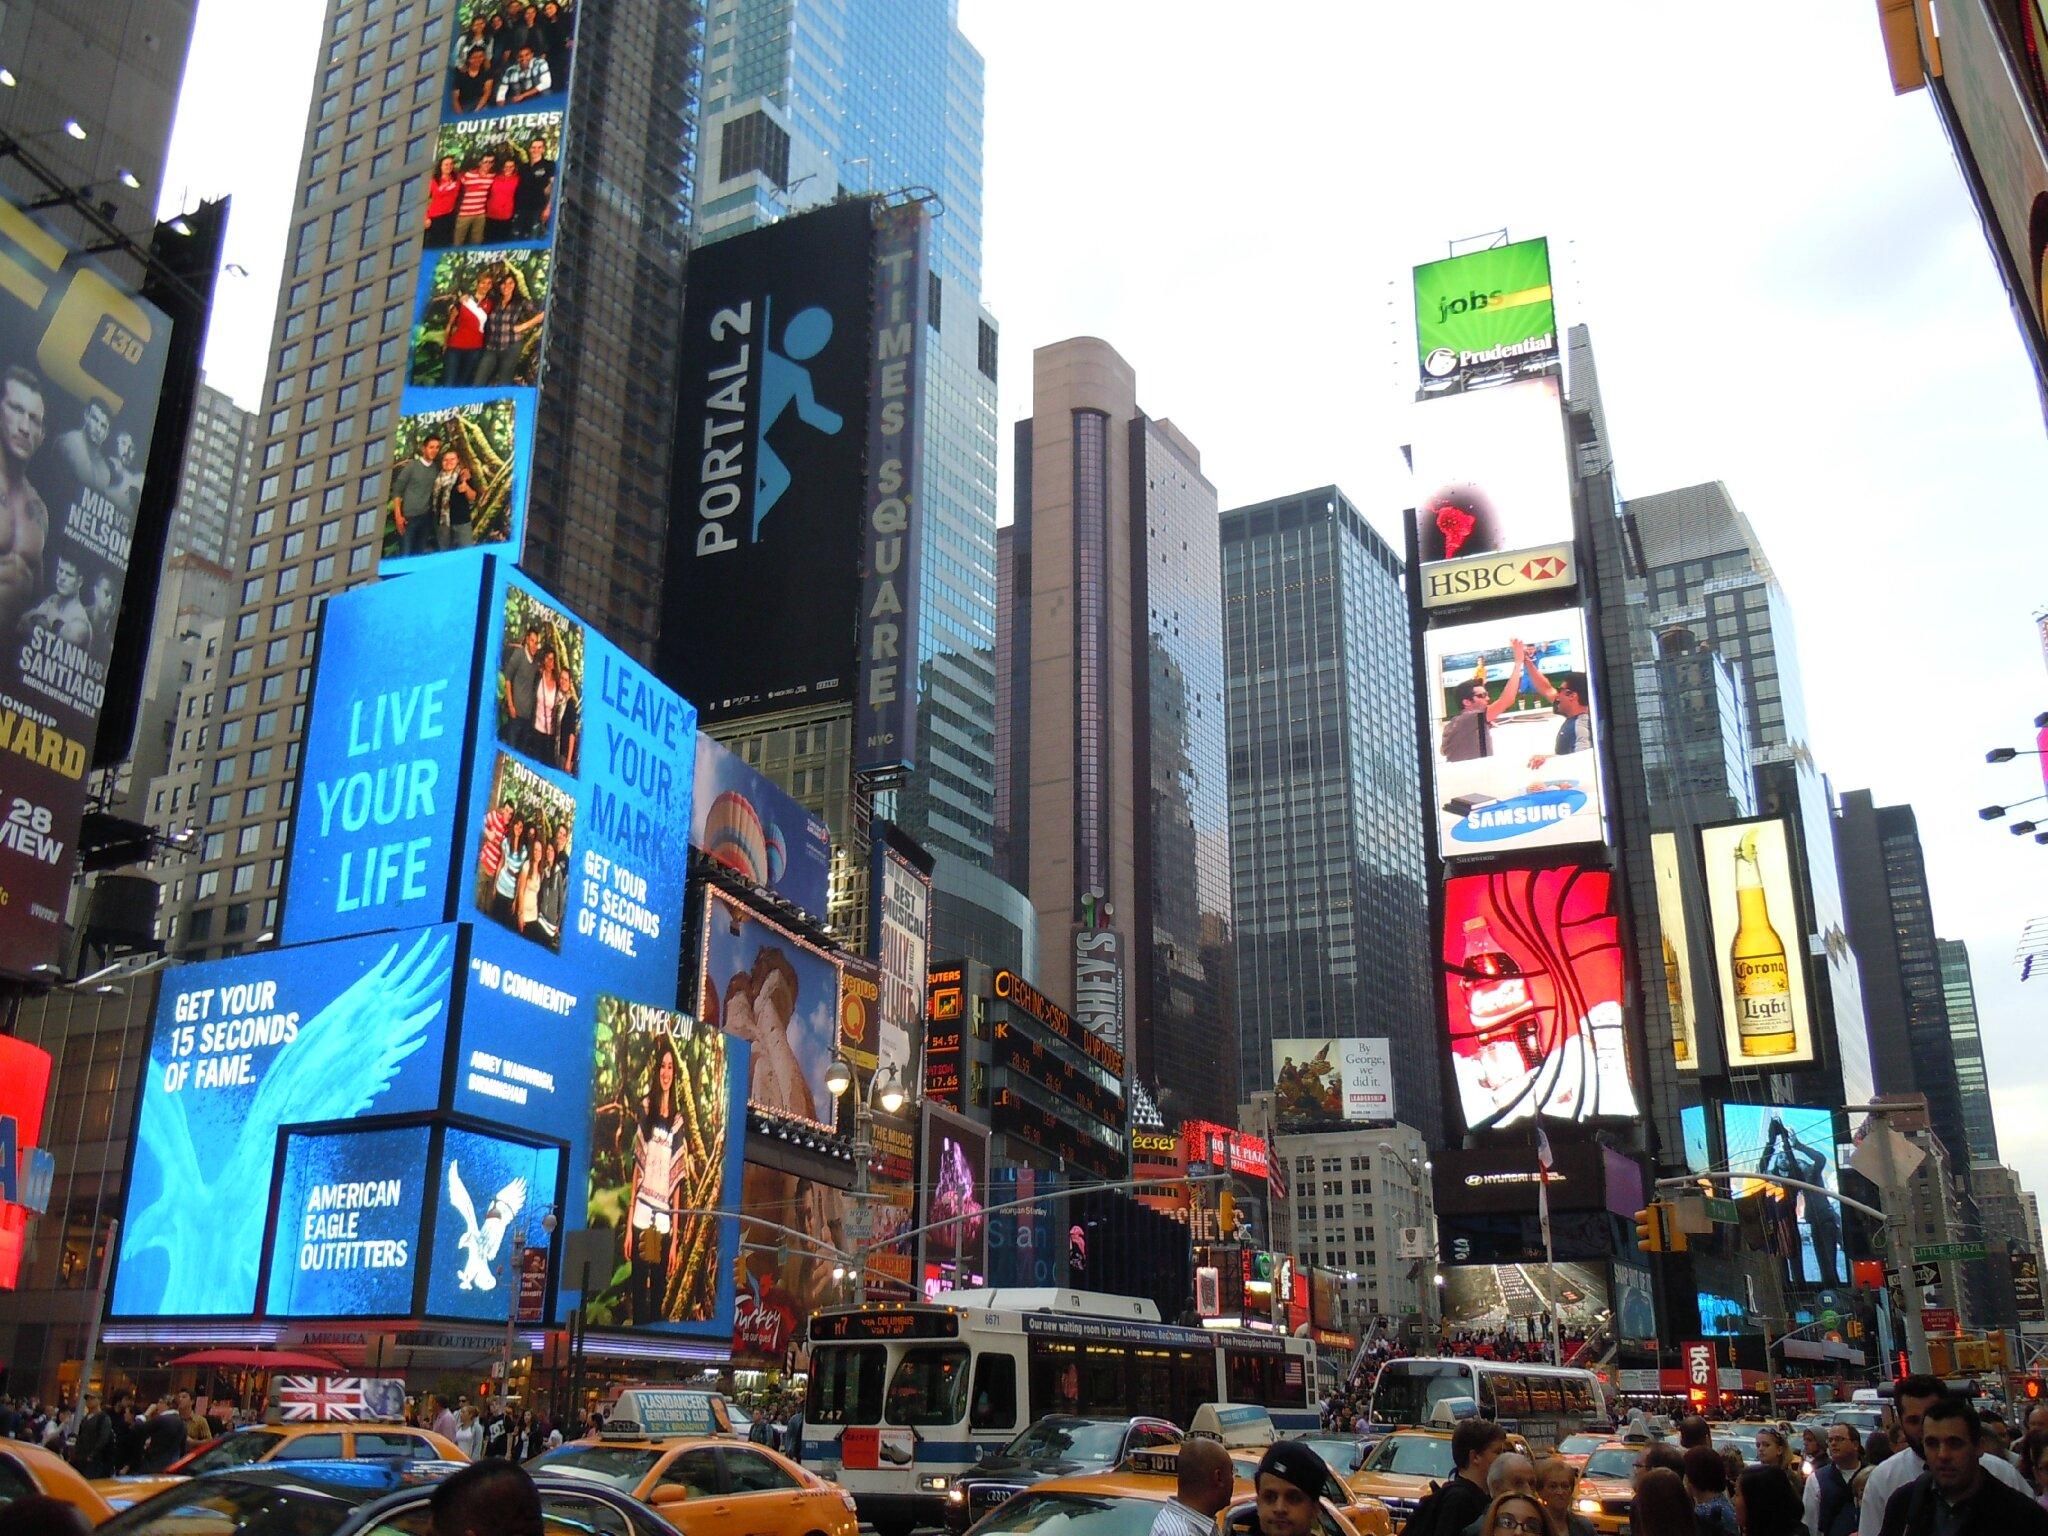 Time Square (29)